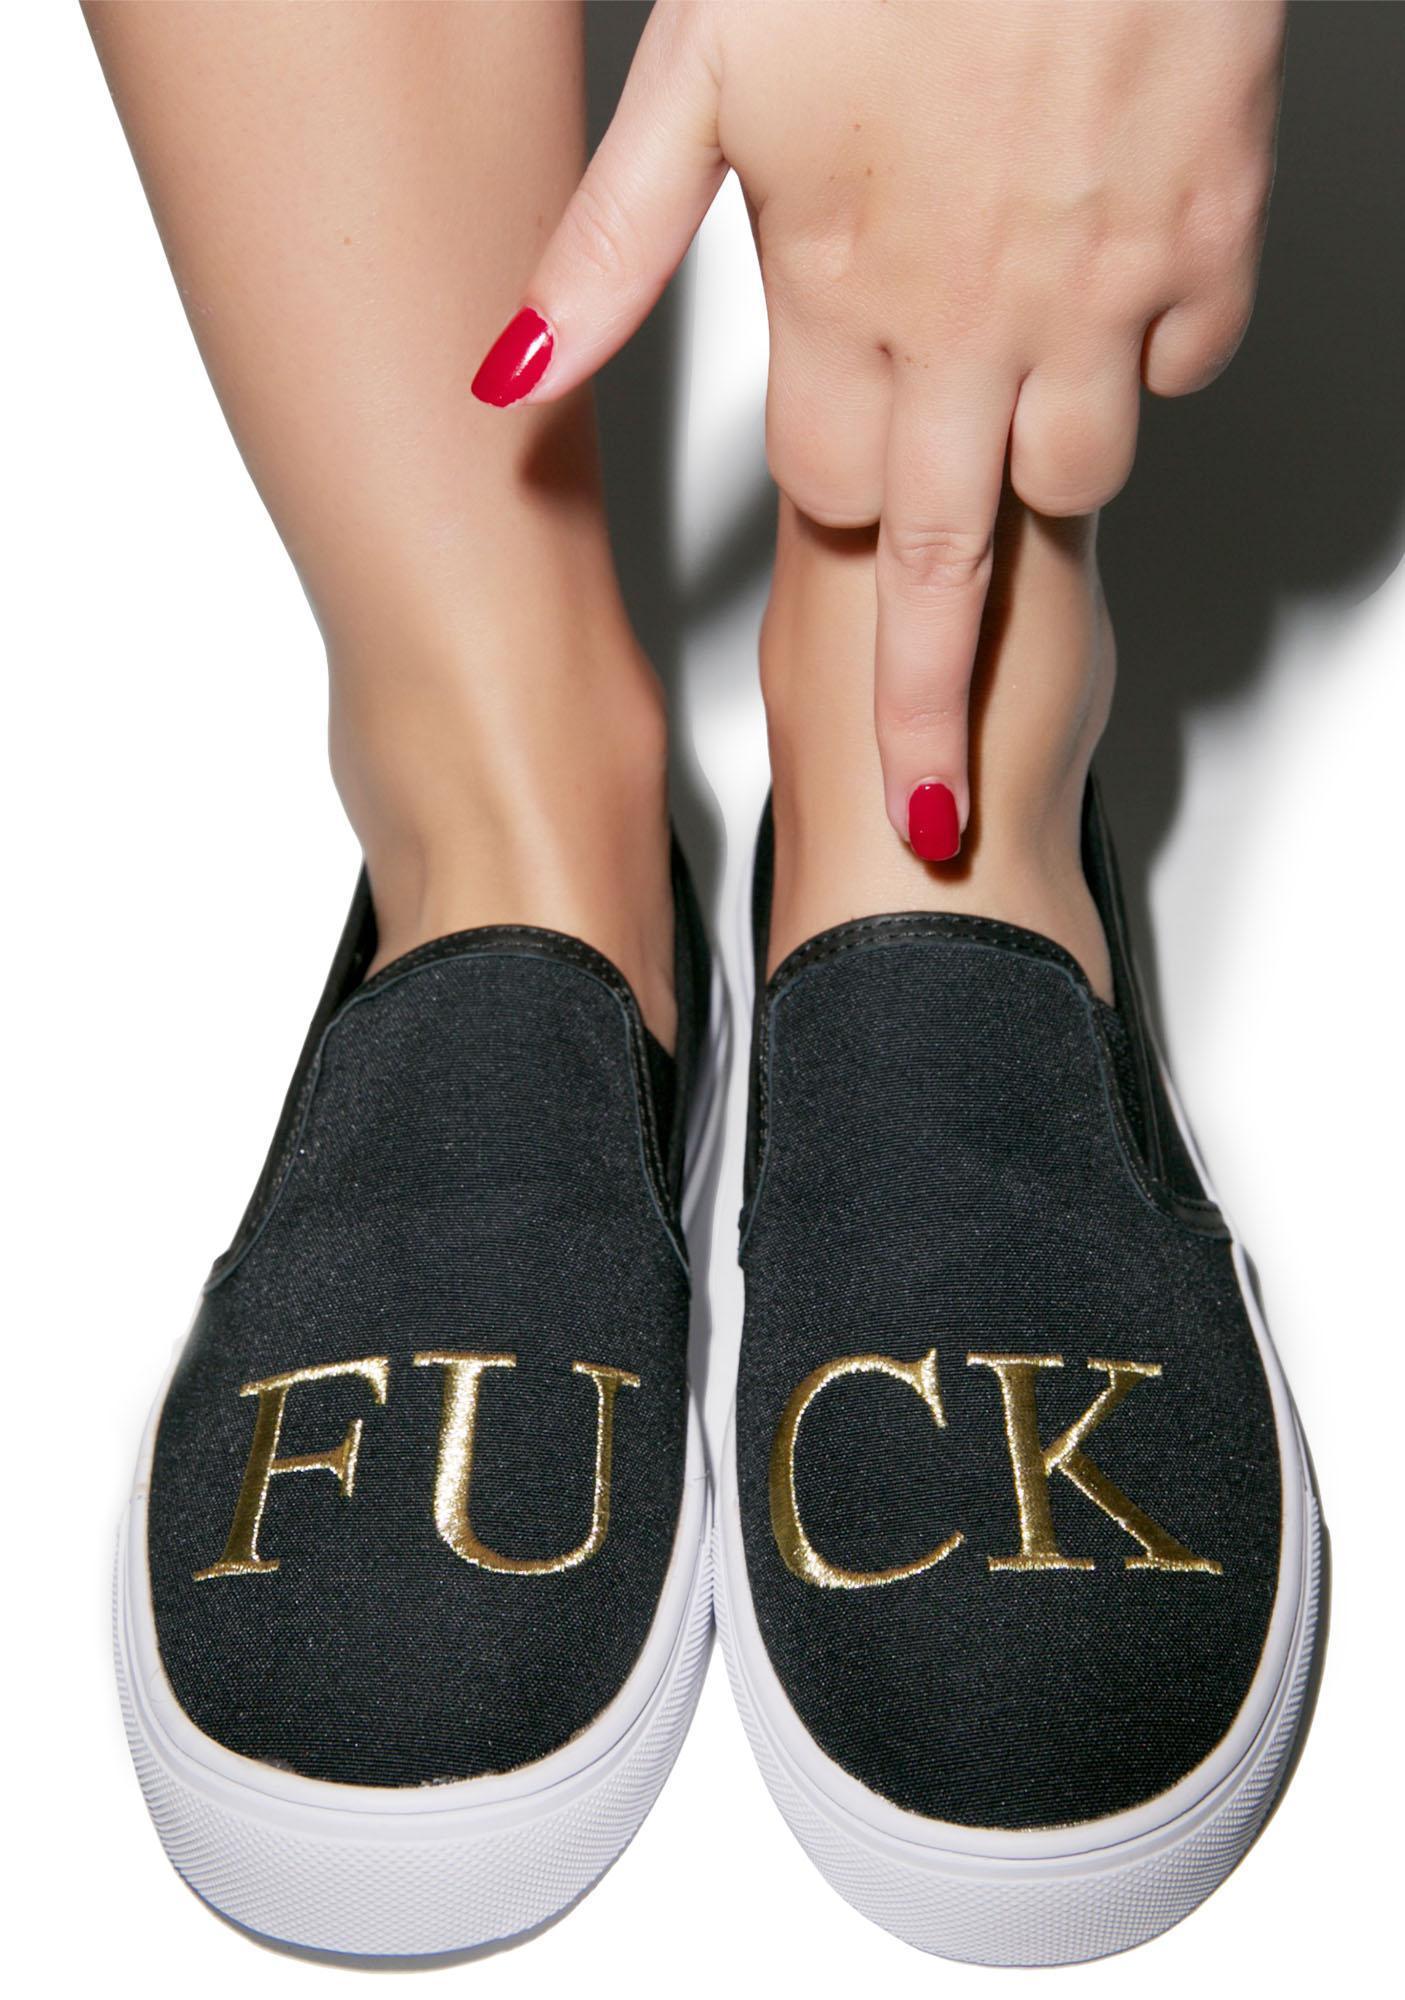 Y.R.U. Chill FU CK Slip-On Sneaker